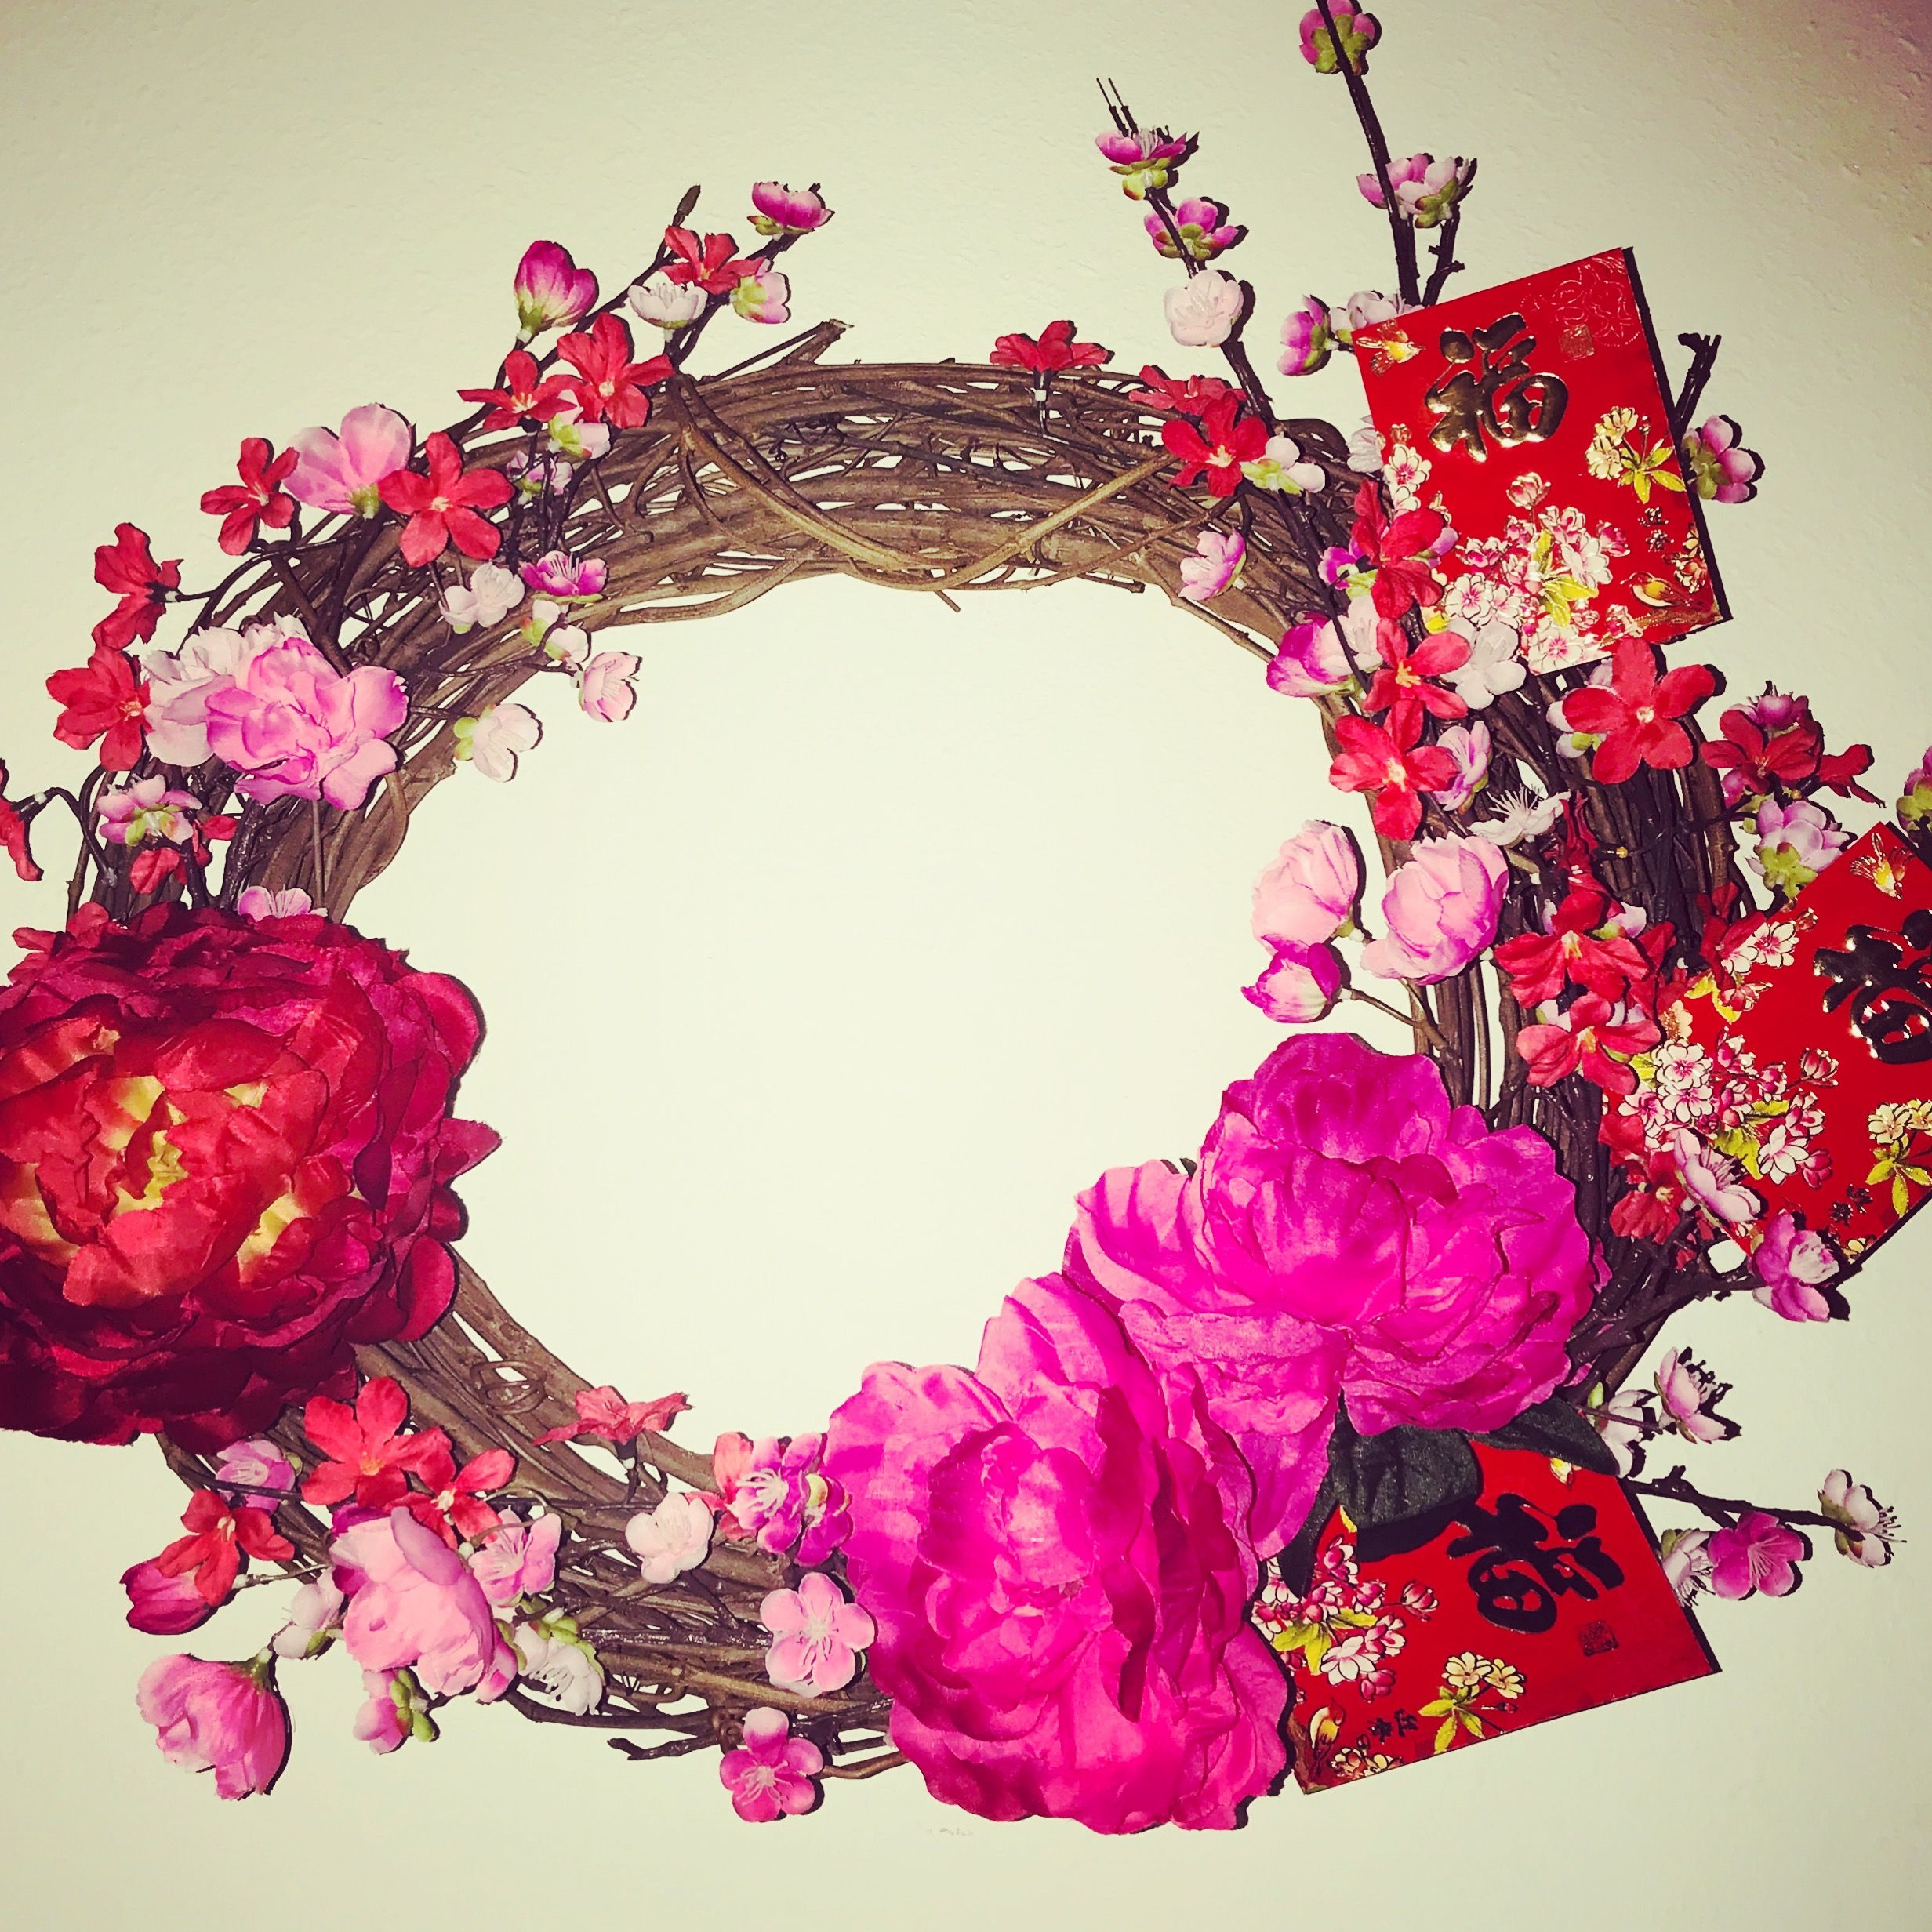 Chinese New Year Tết Lunar New Year Wreath TET